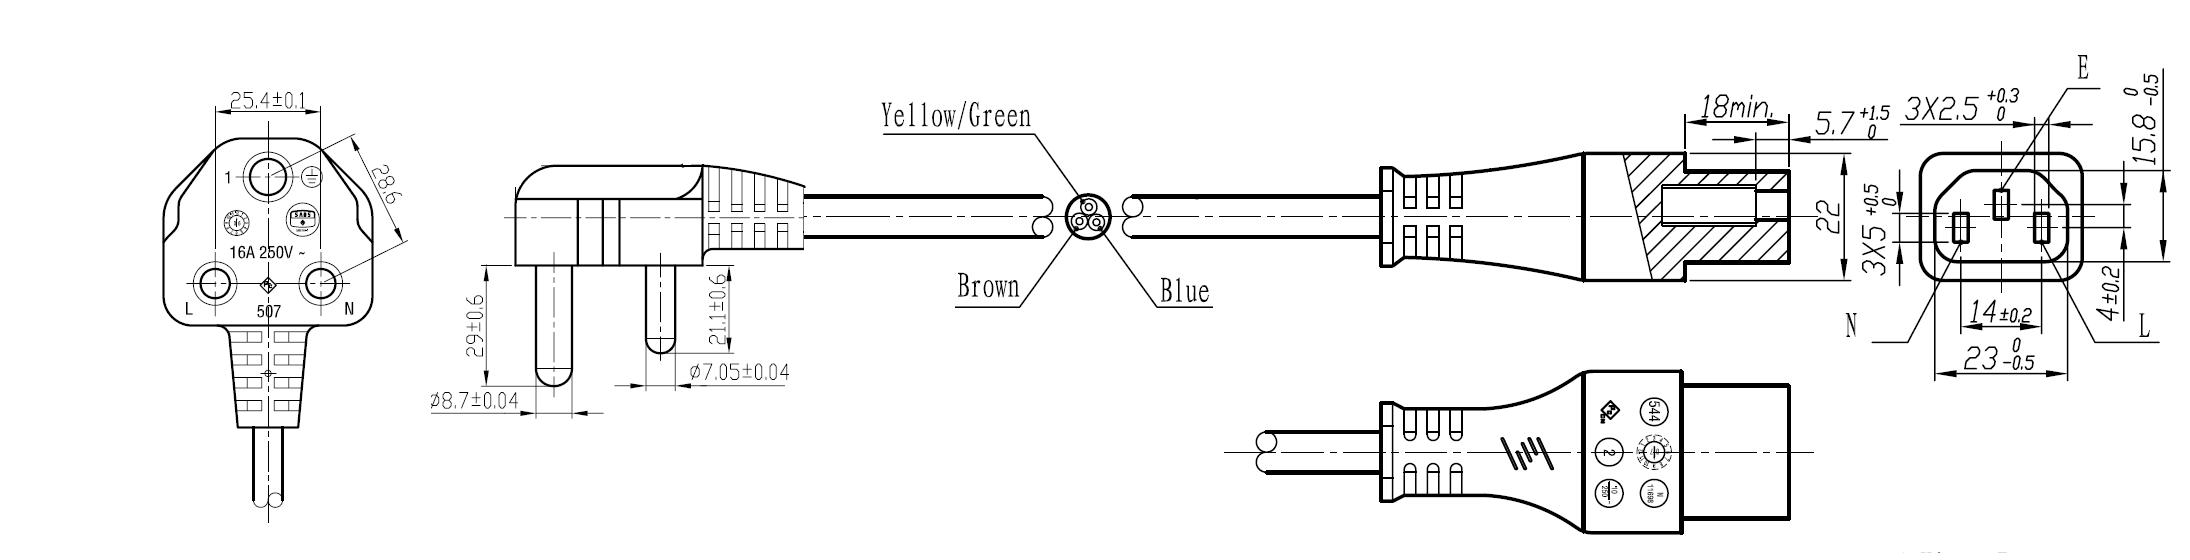 india power cords mega electronics inc rh megaelectronics com usb power cord diagram power cable diagram